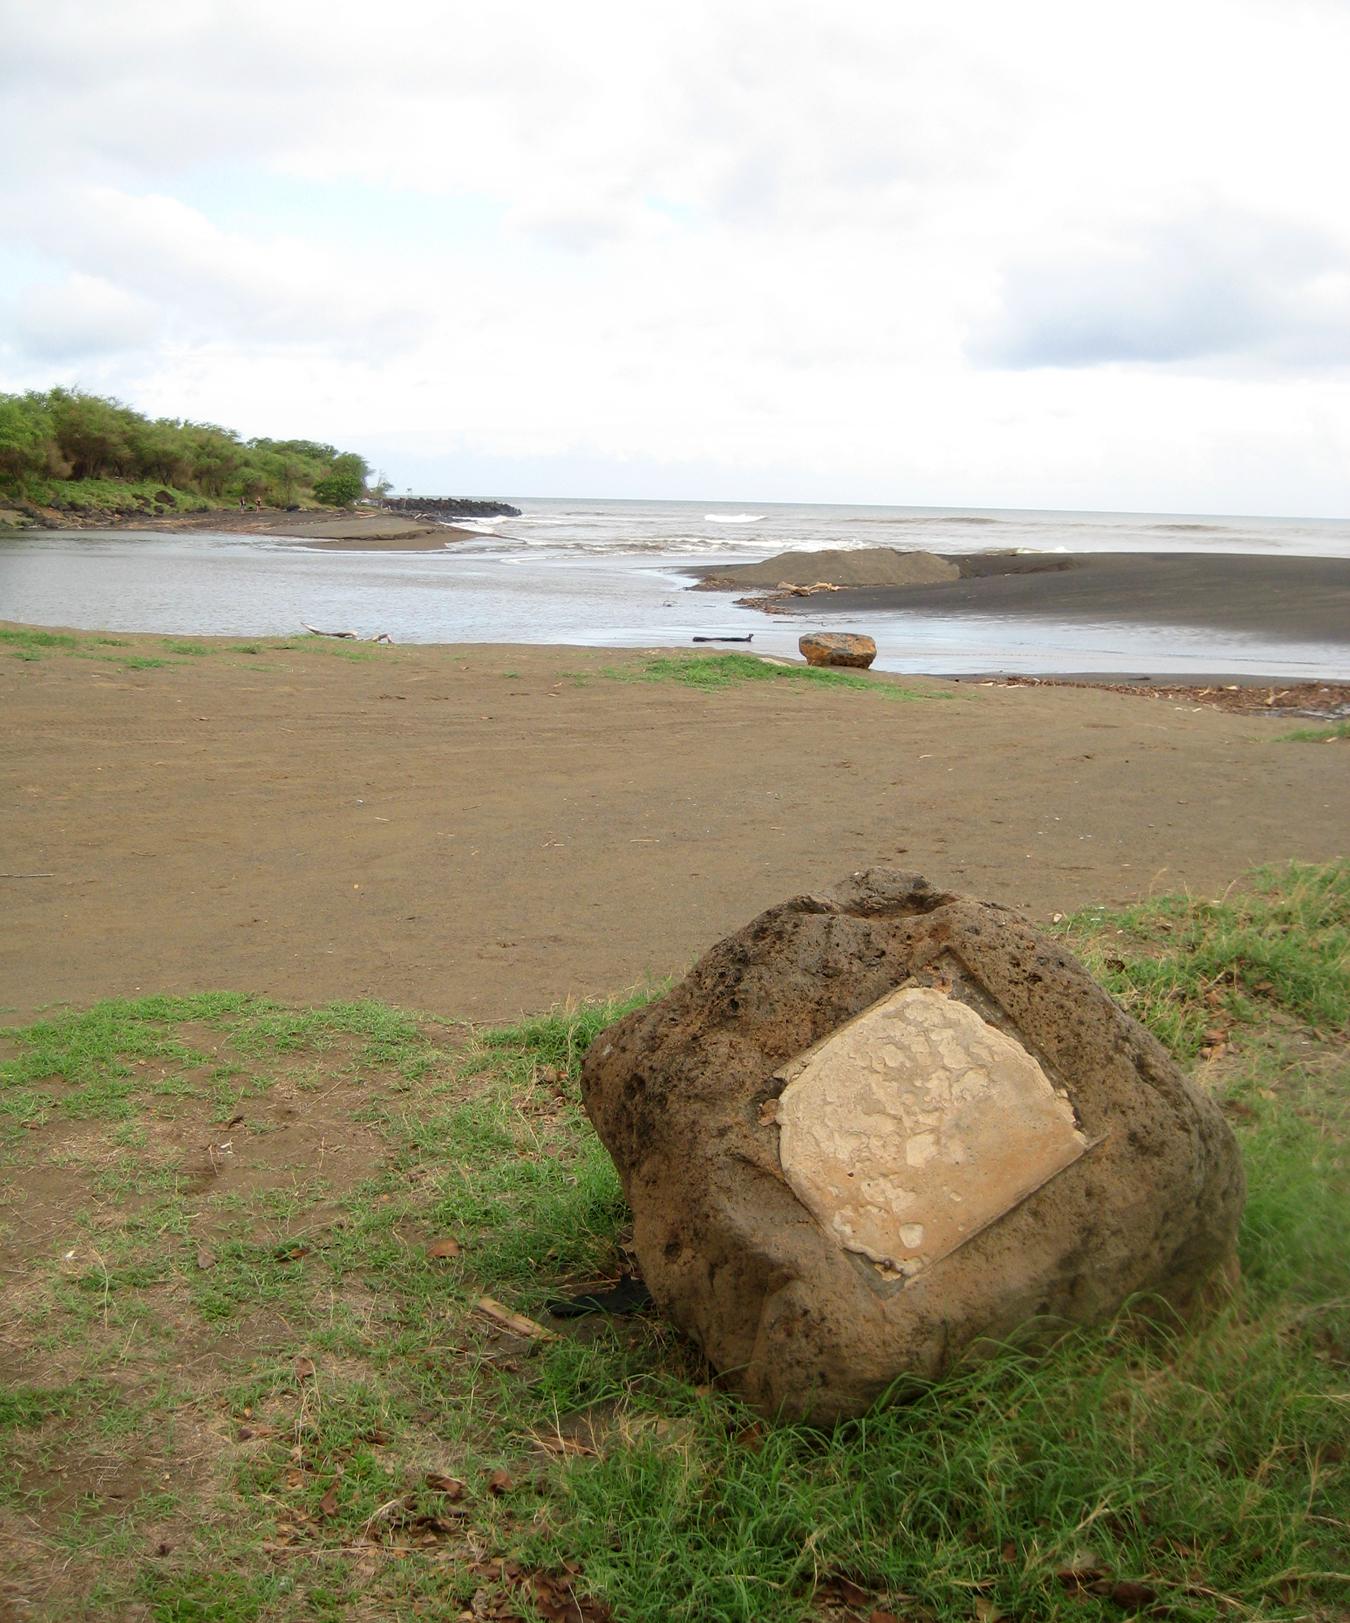 Stone marking Cook's landing at Waimea Bay, Hawaii, in January 1778. Photo taken on August 20, 2009.